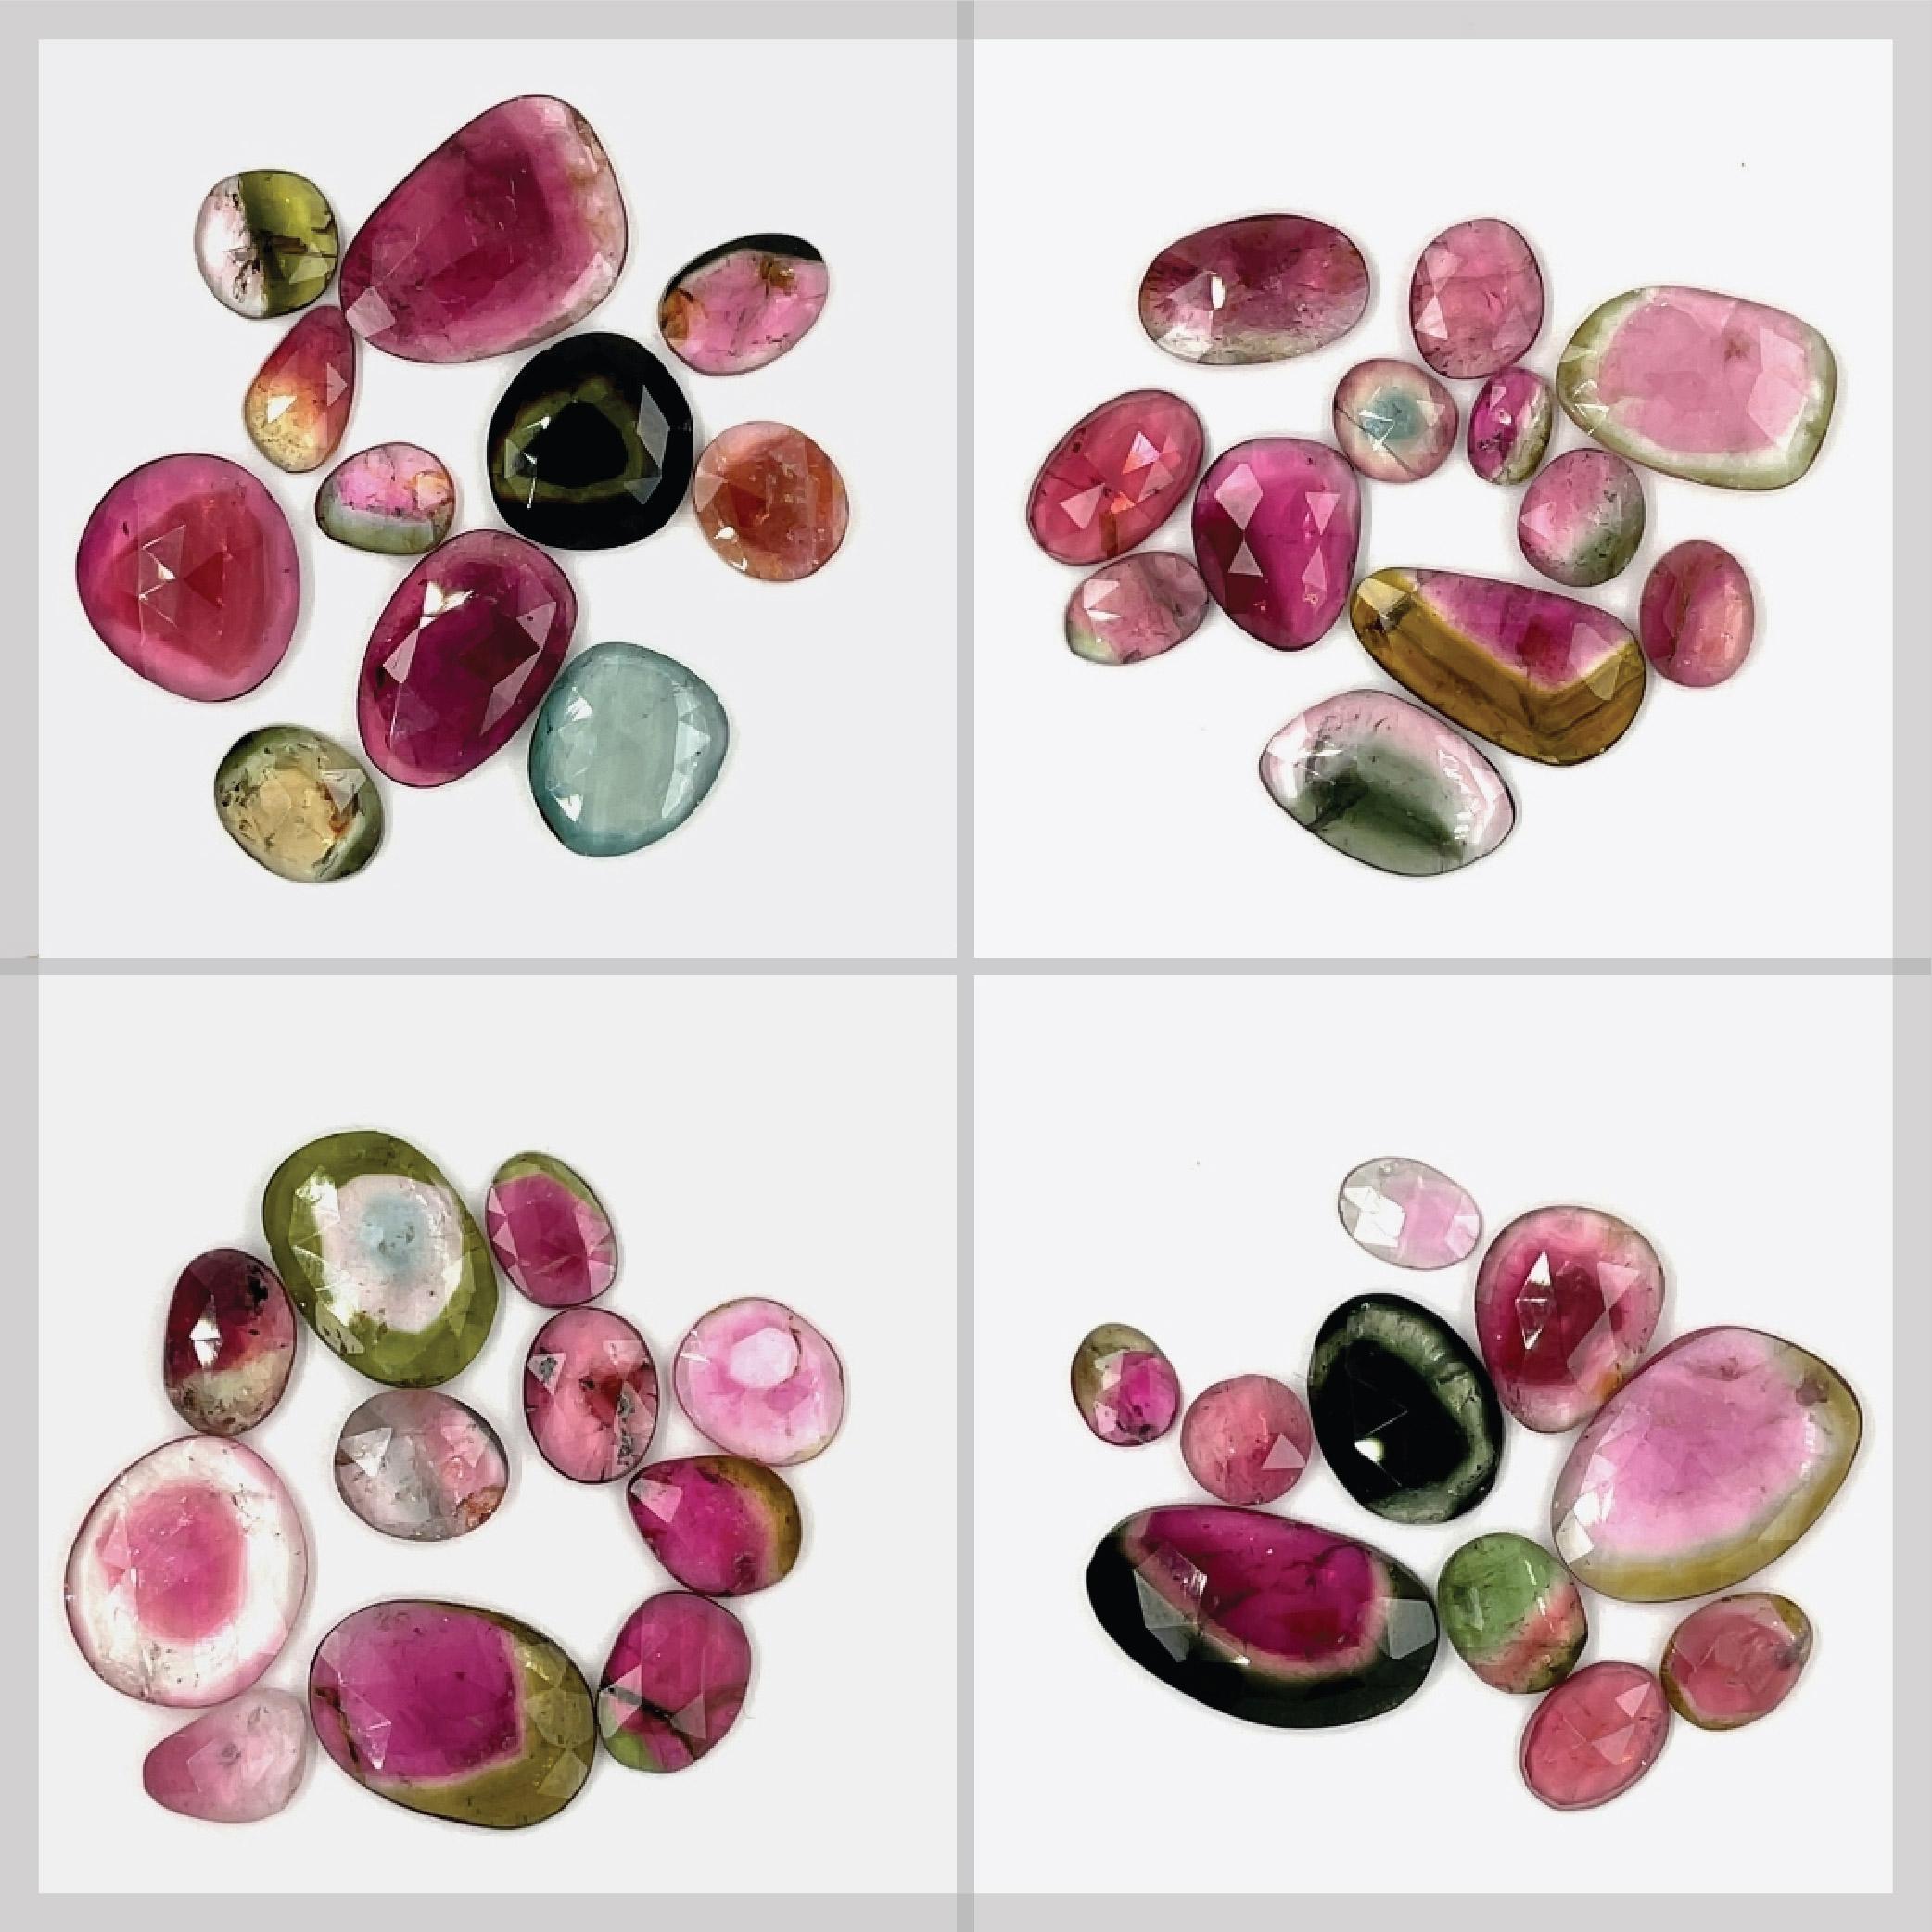 Rose cut watermelon tourmaline for jewellery making